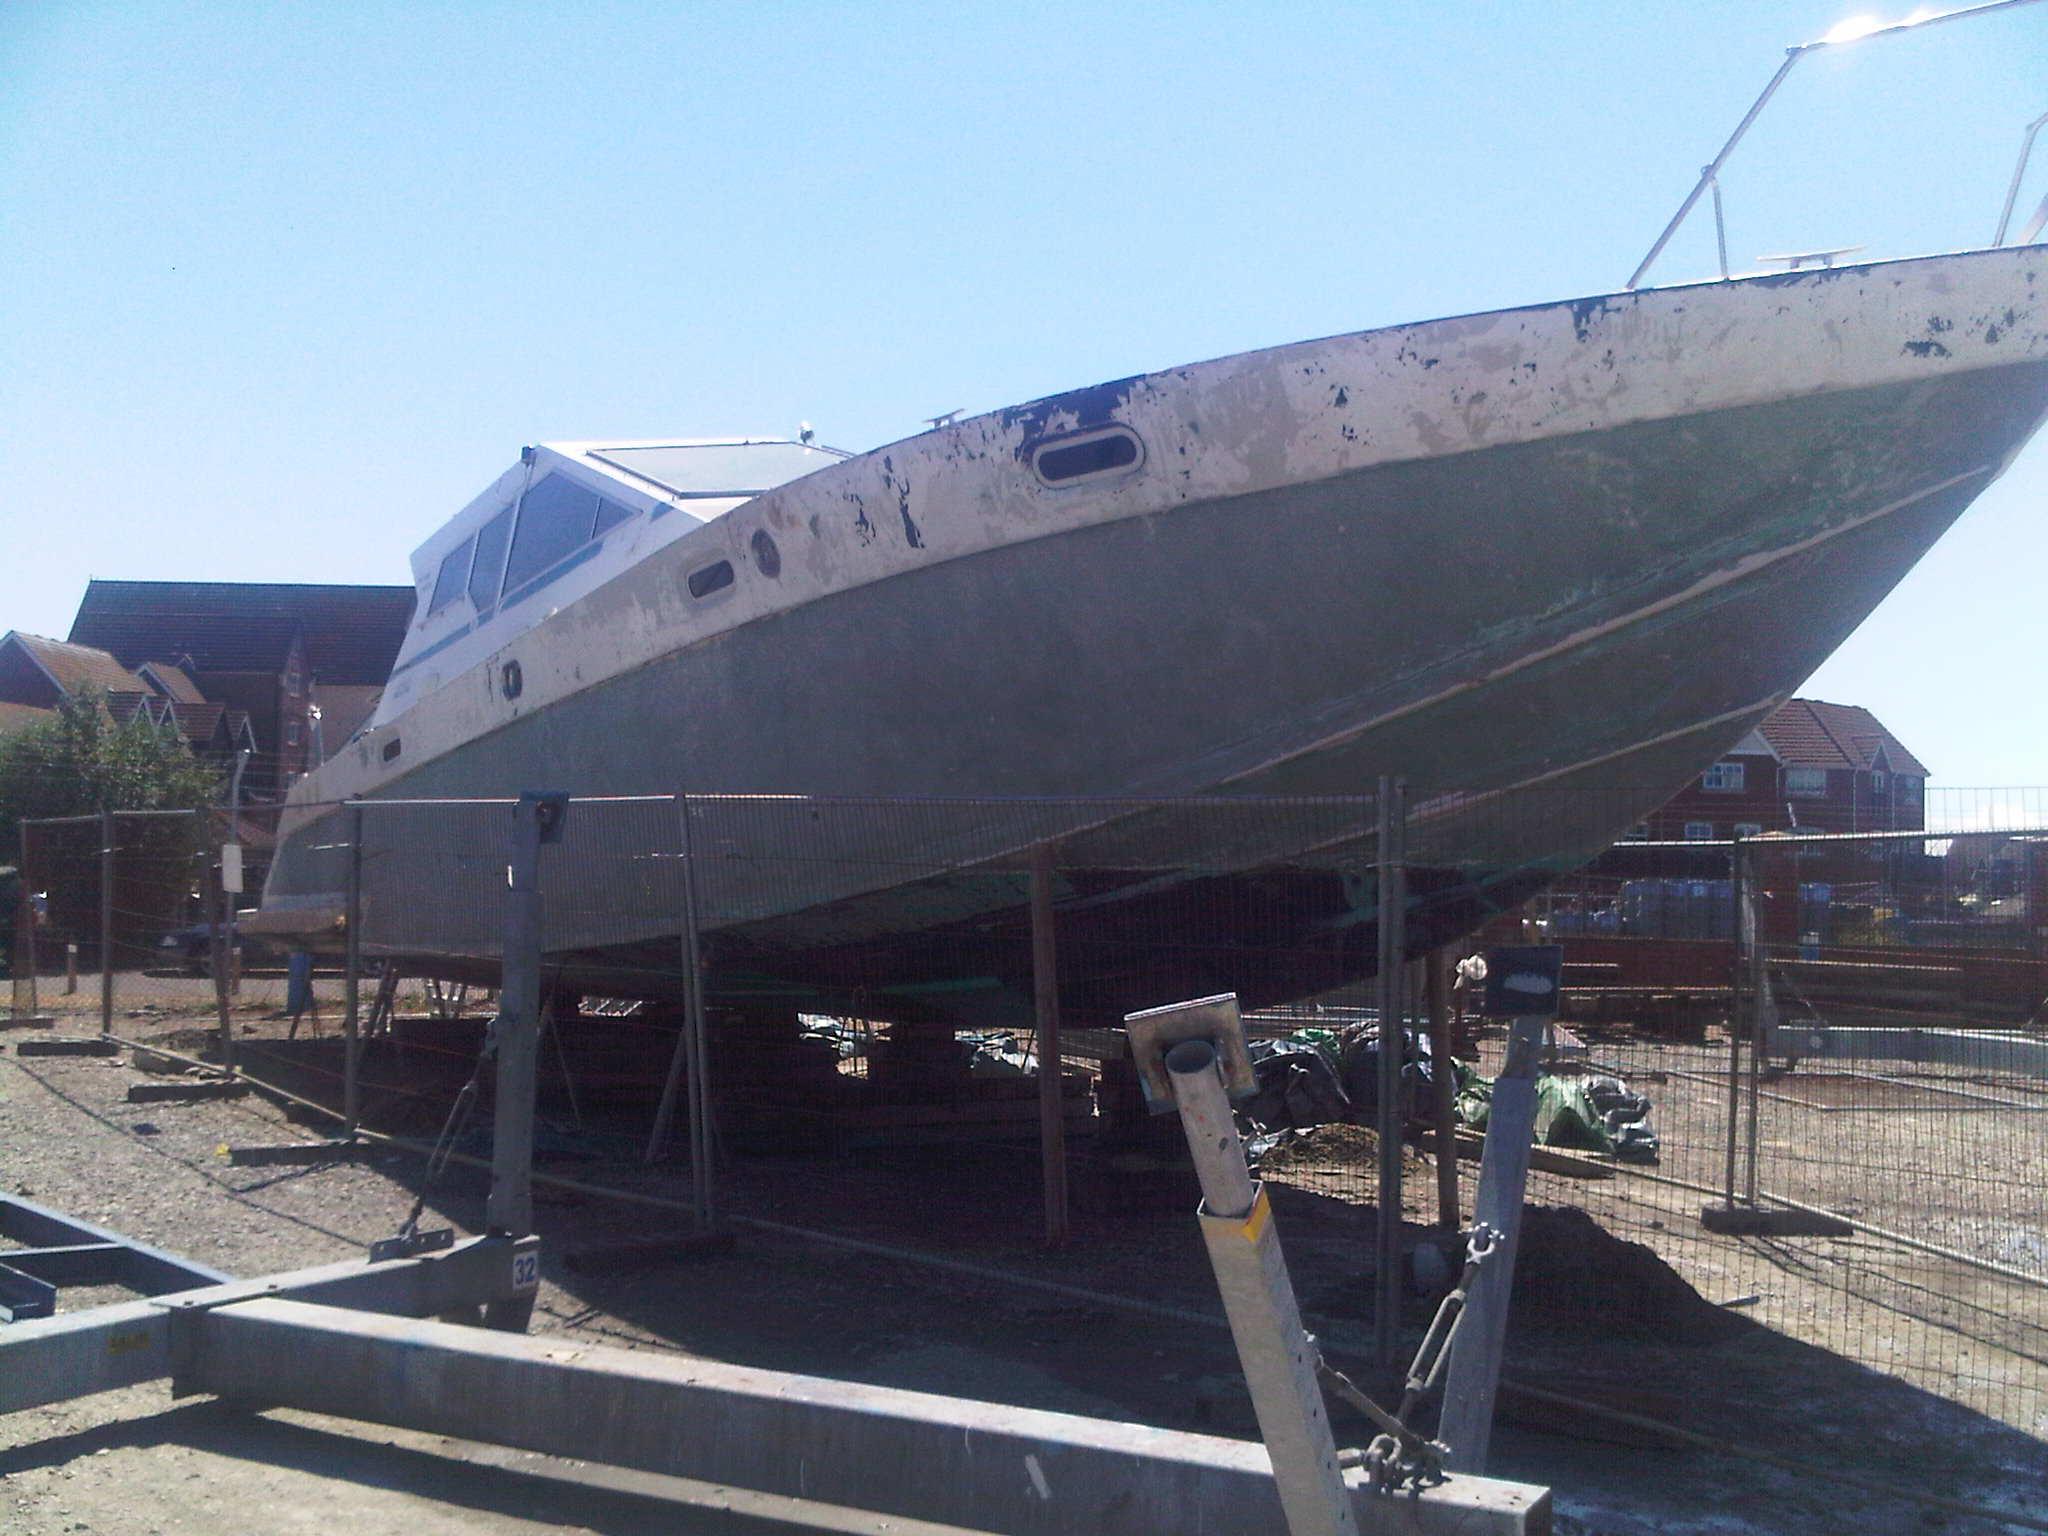 Boat 02B